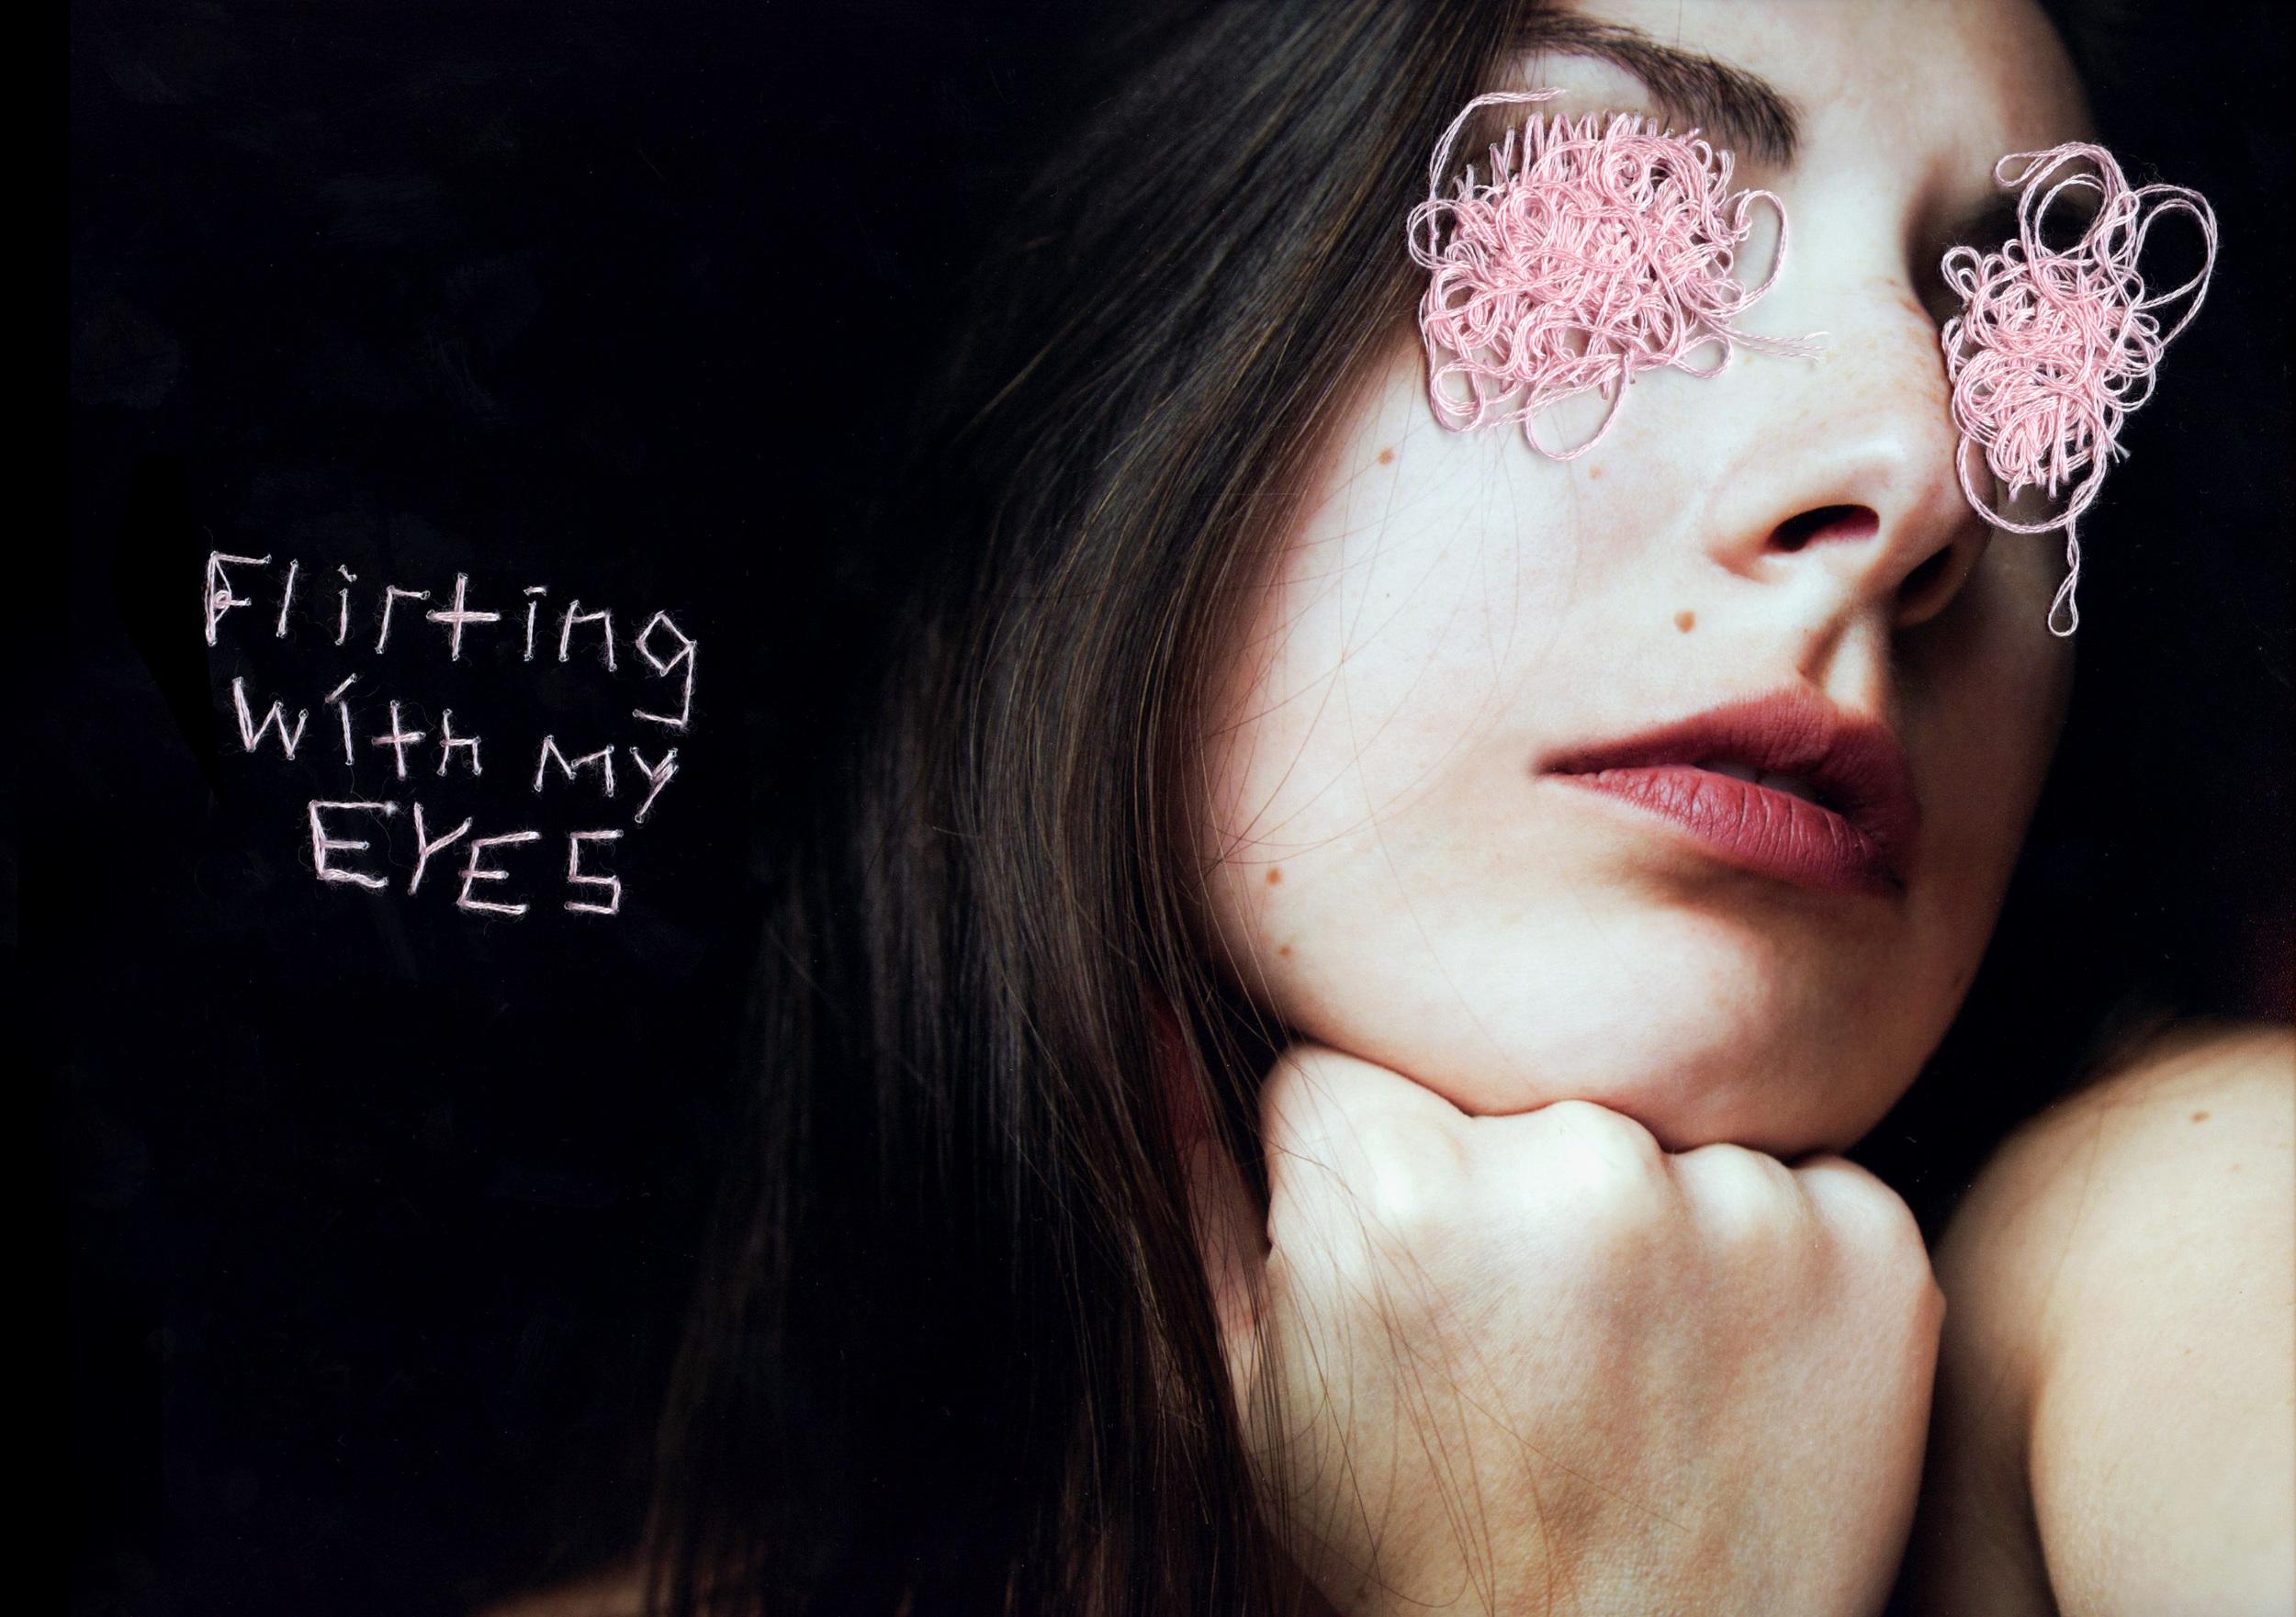 flirtingwithmyeyes-2.jpg